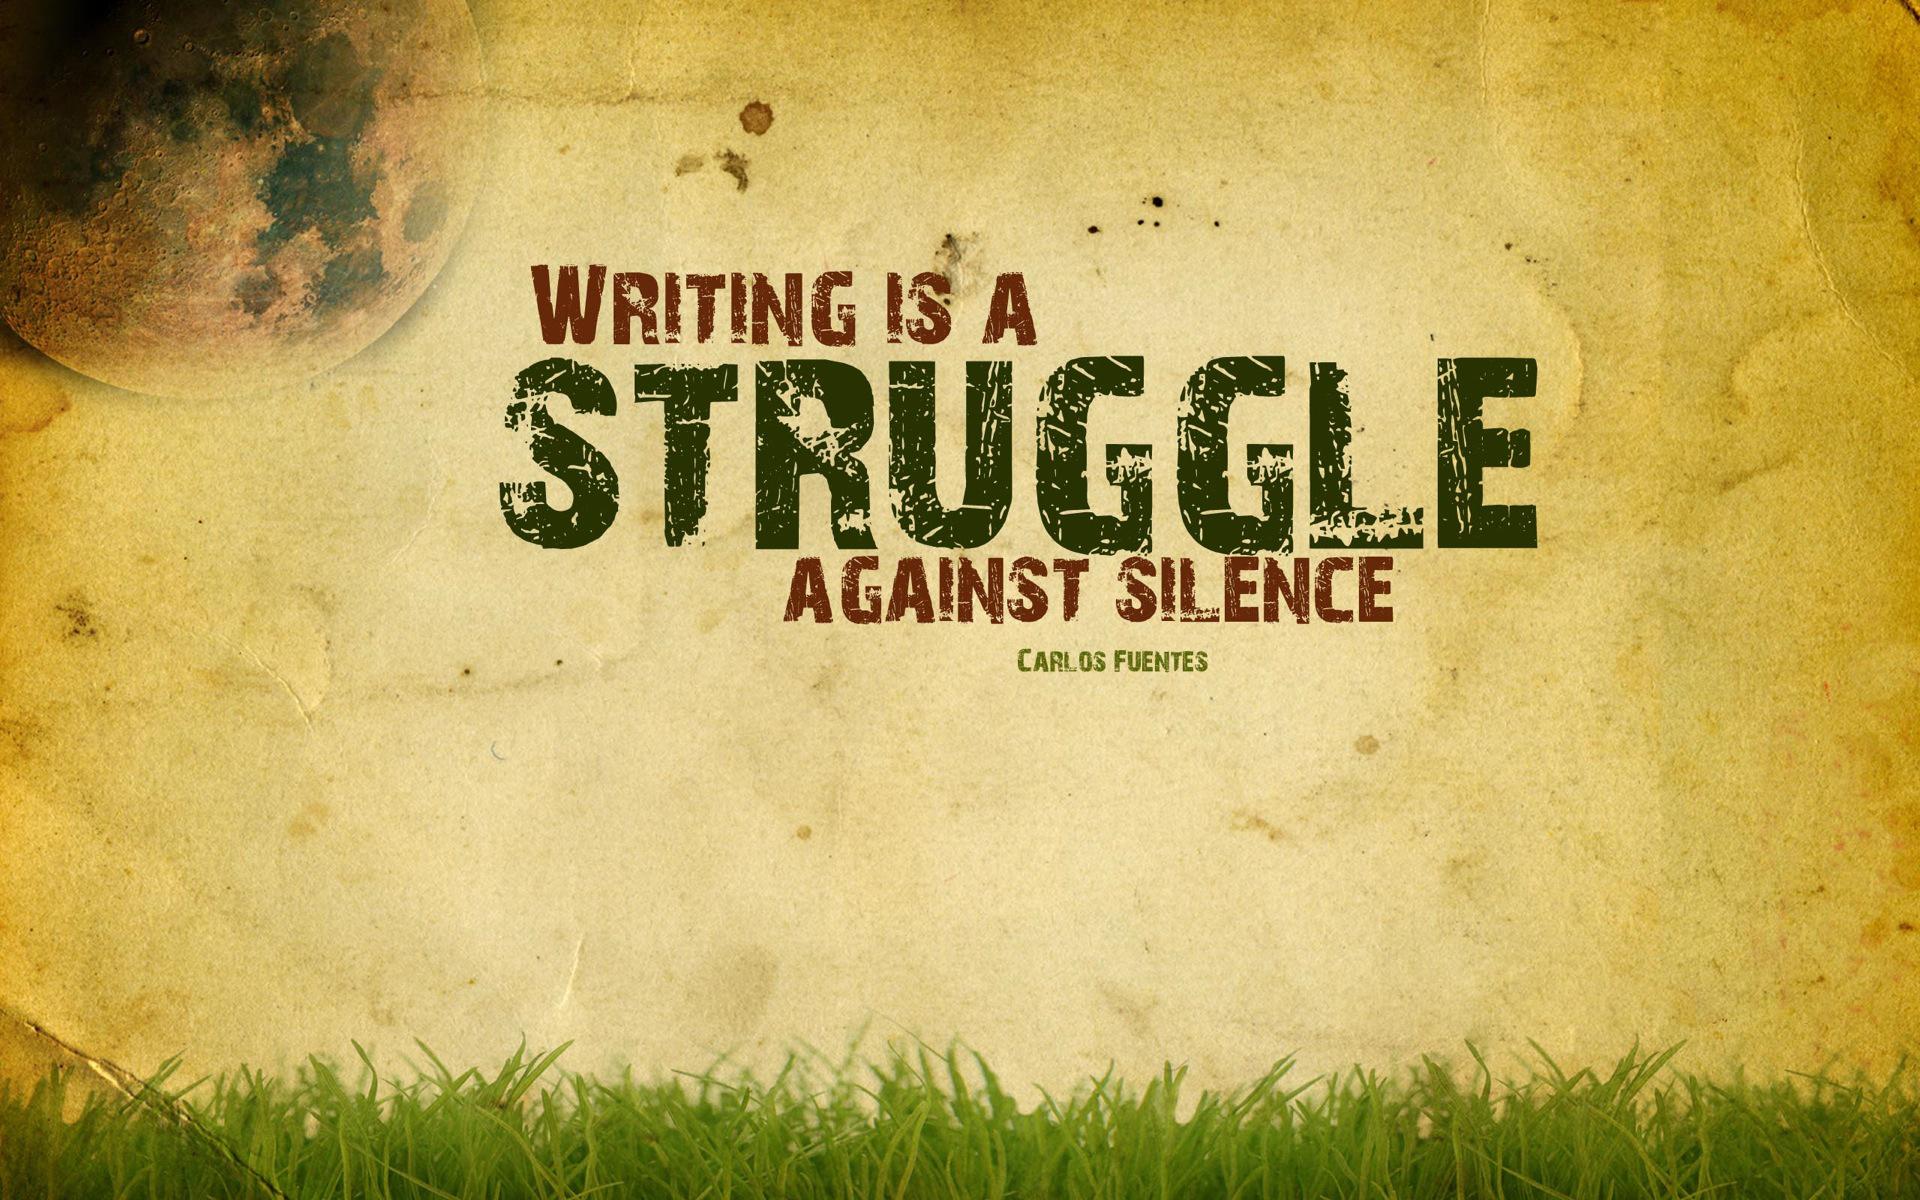 Motivational Quotes Wallpaper Hd Wallpapersafari